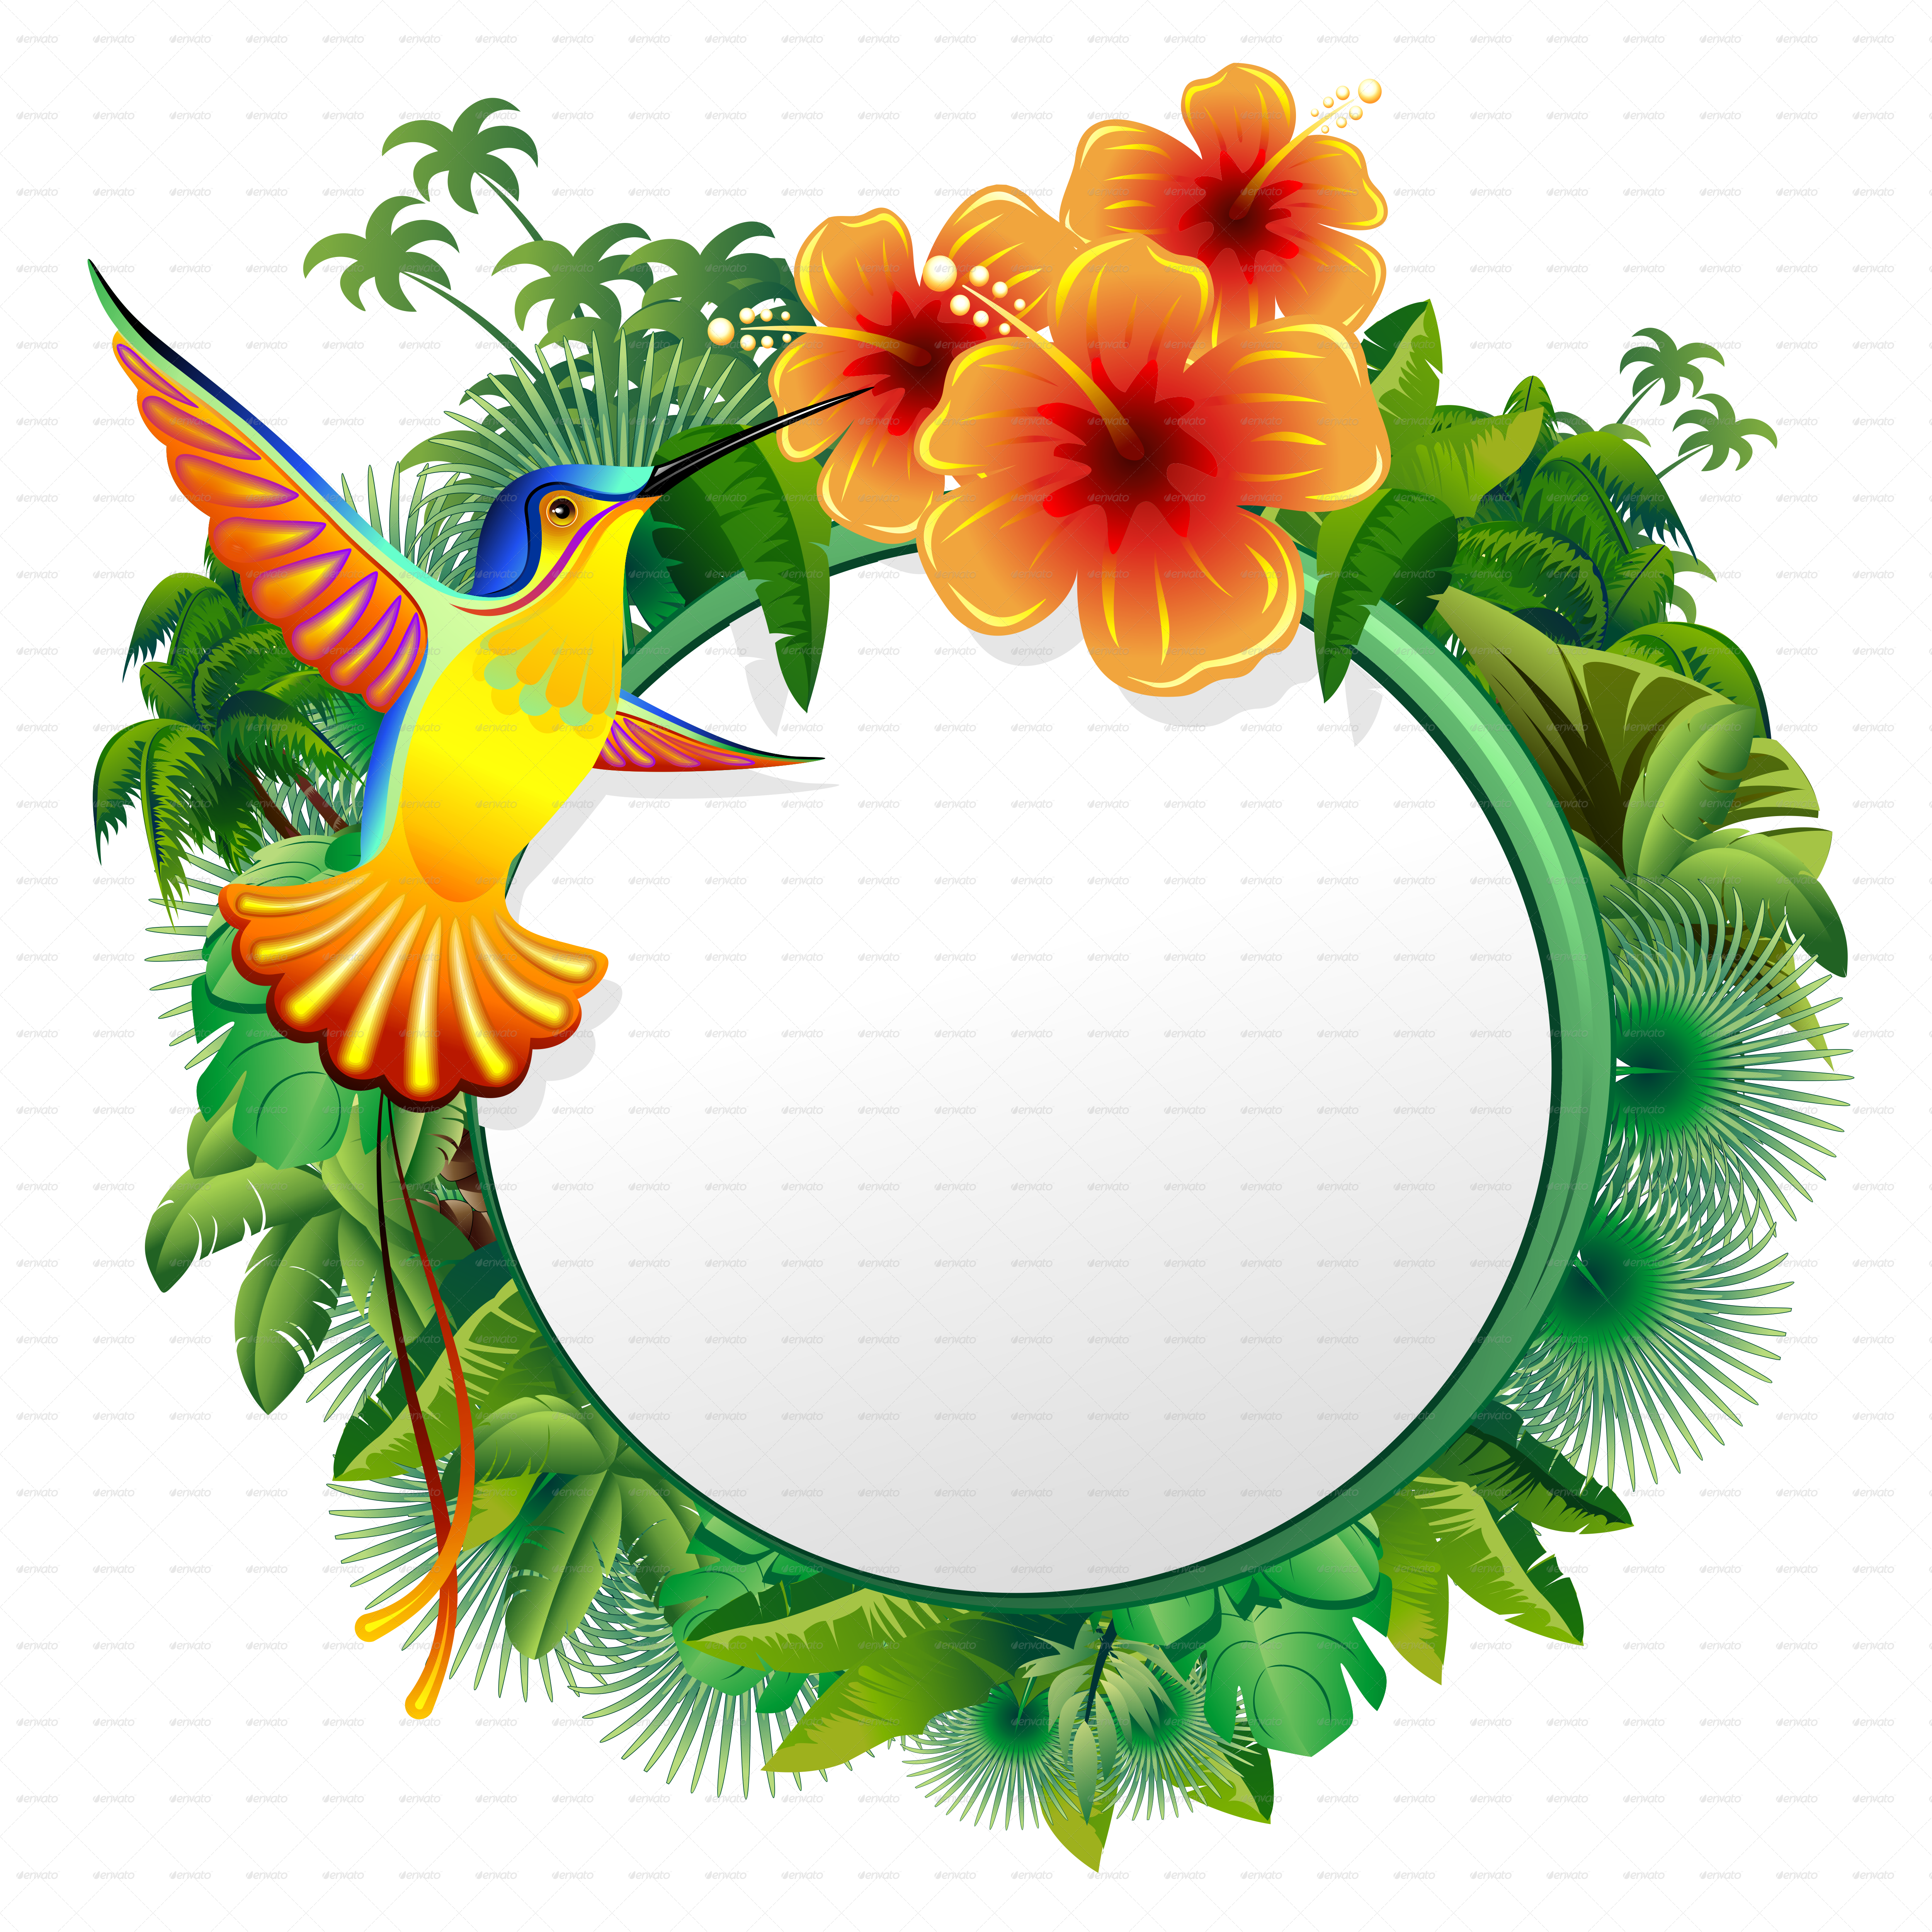 Hummingbird clipart jungle flower. Exotic designs by bluedarkat